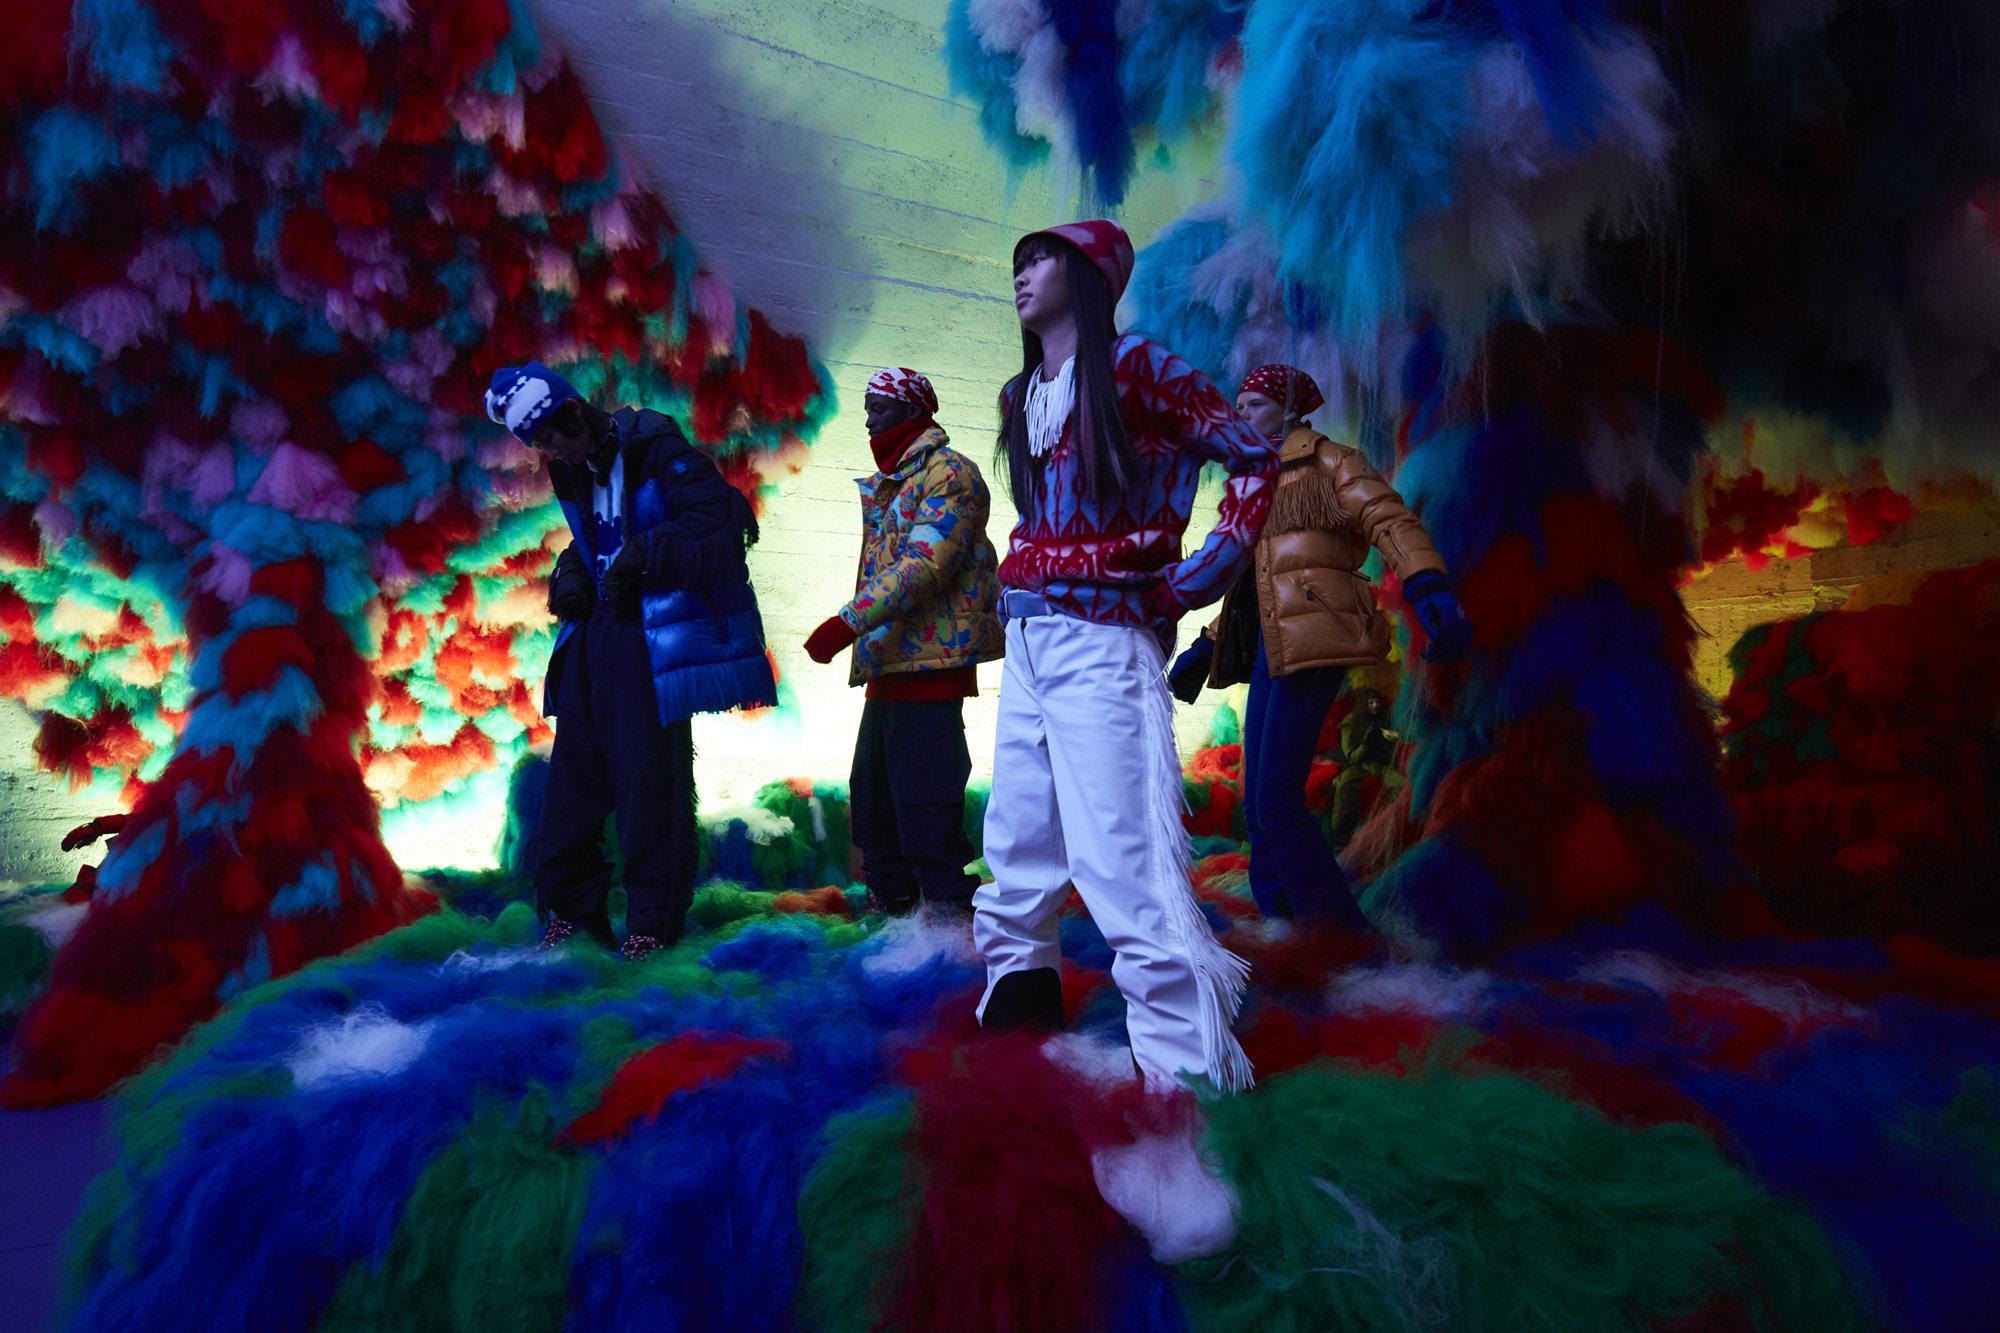 Moncler Genius 联名合作项目第二季亮相米兰时装周,面向公众展出全部十款新系列